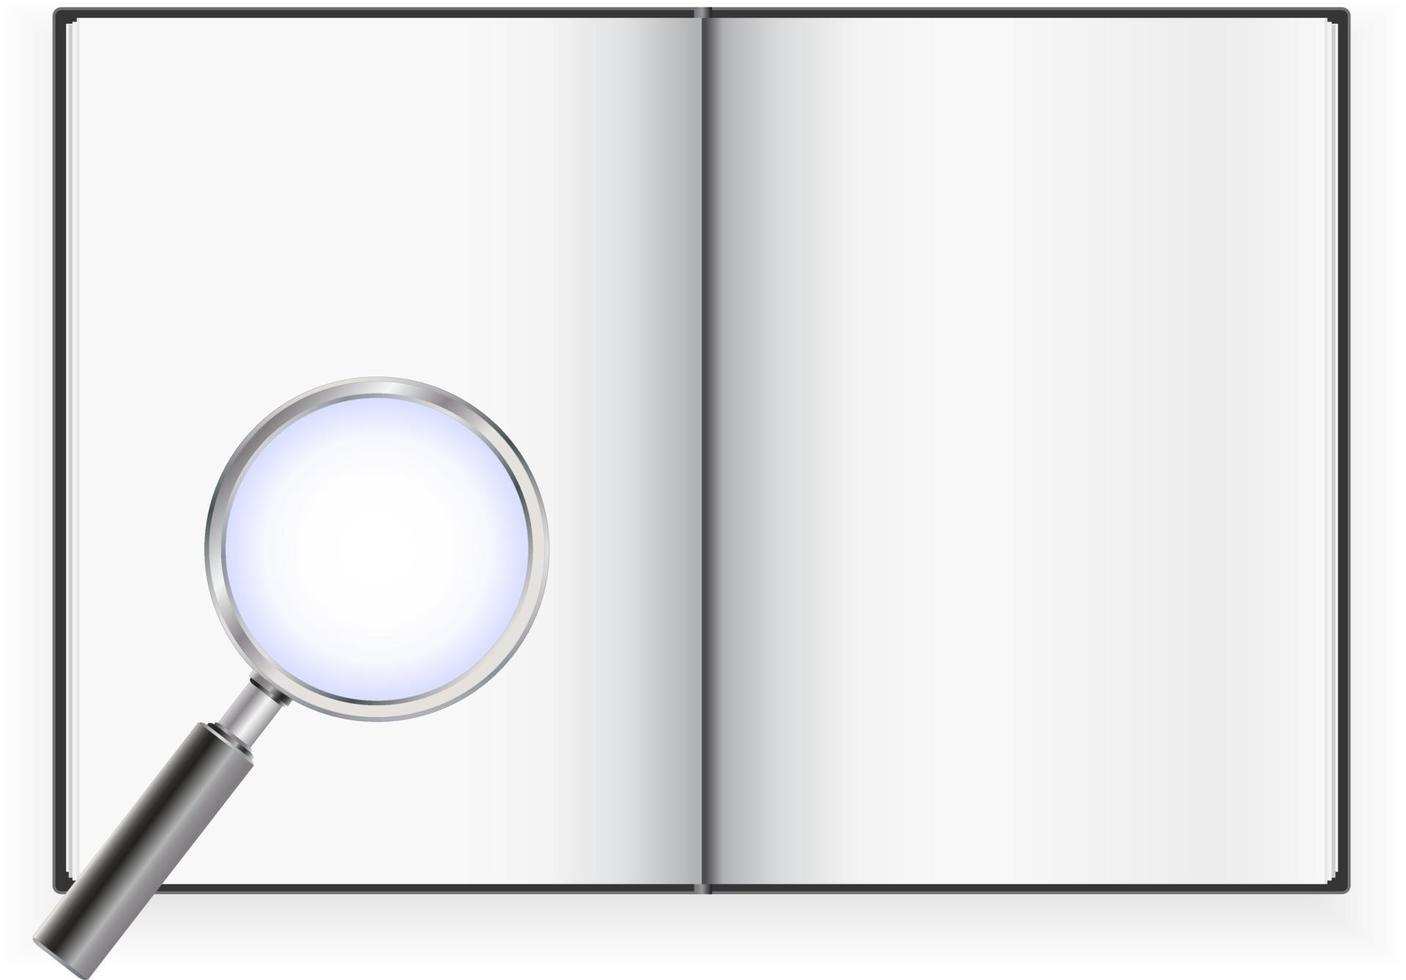 livro aberto com lupa vetor